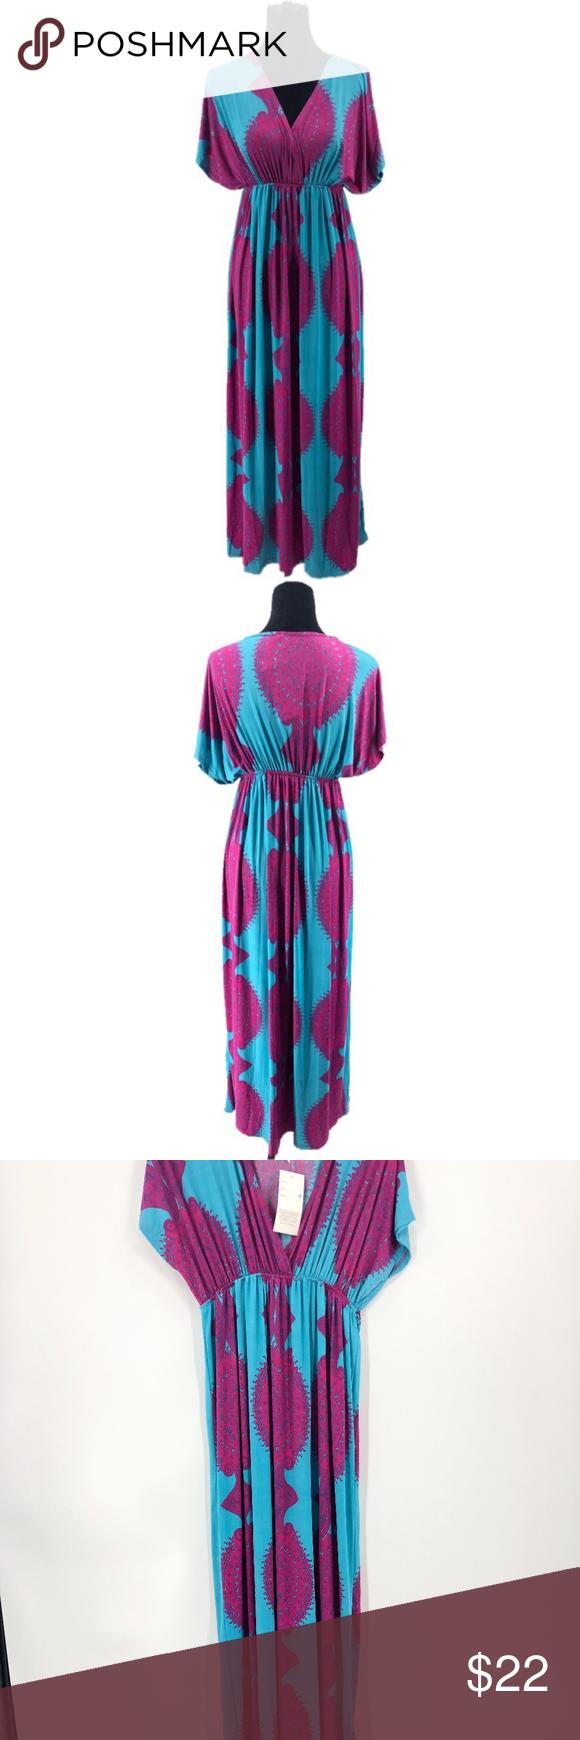 India Boutique Plus Size 2x Maxi Dress India Boutique Dresses Maxi Dress New [ 1740 x 580 Pixel ]